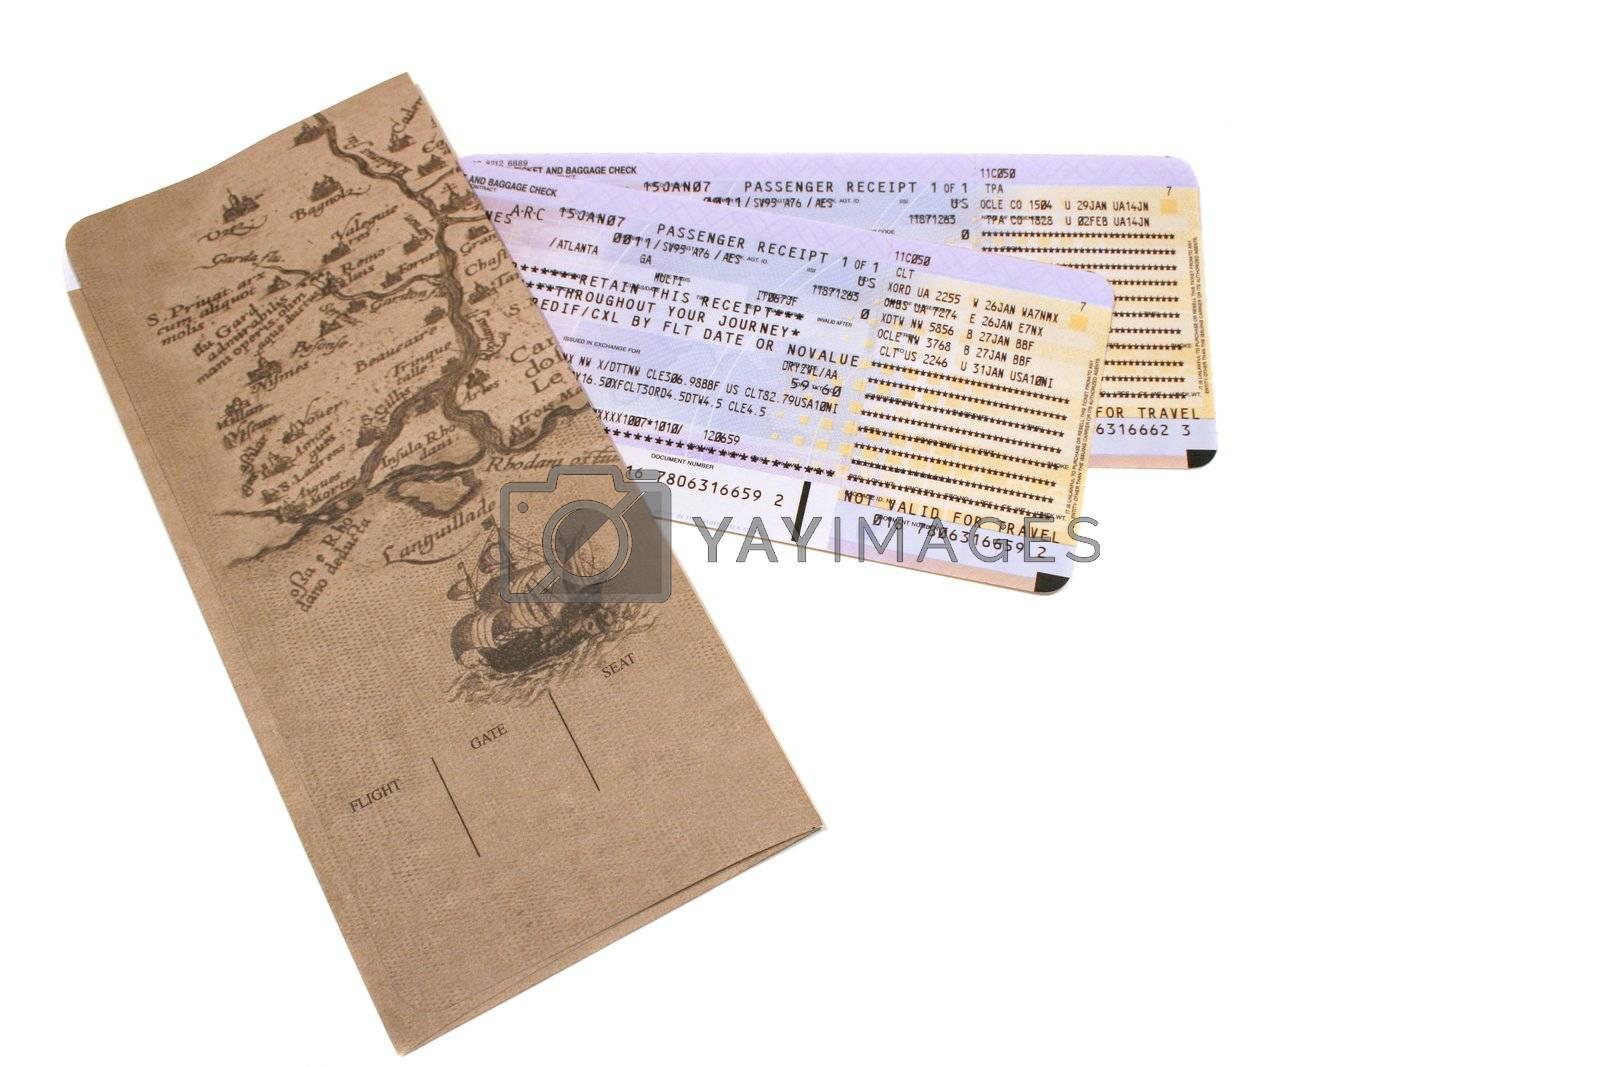 Travel Documents by dbvirago